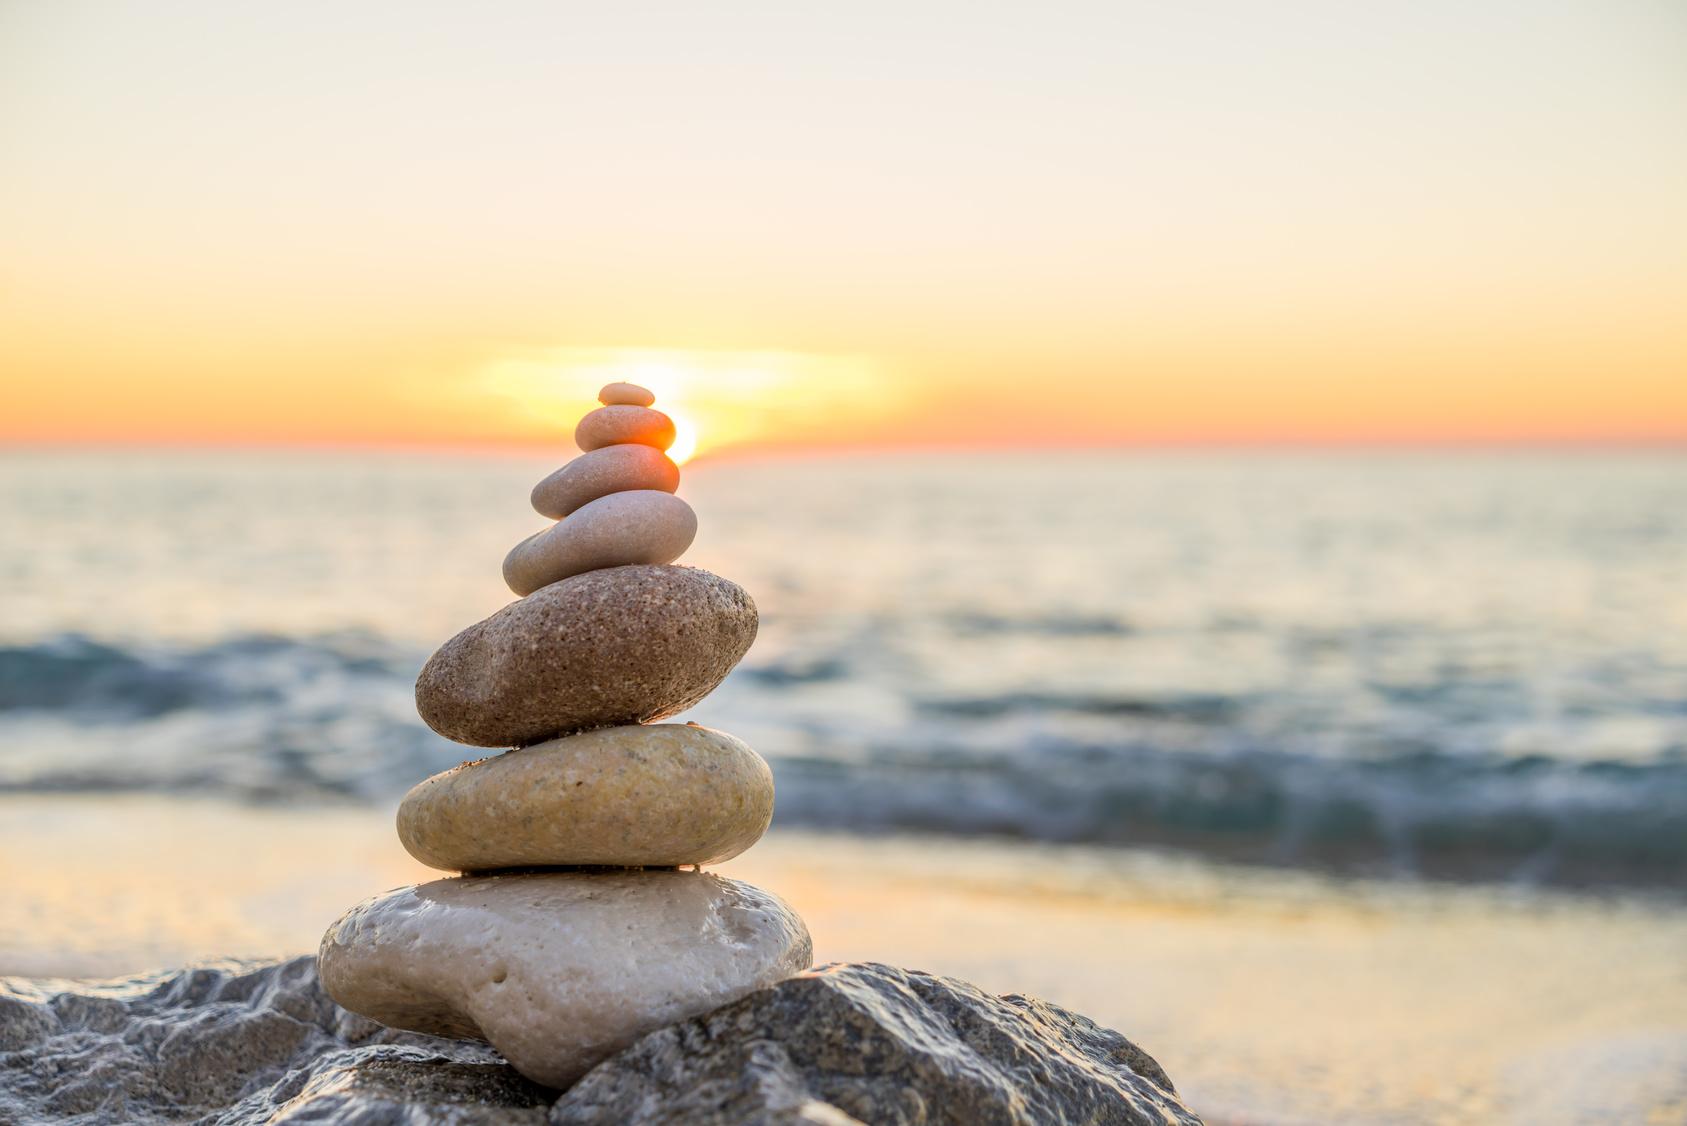 Stones pyramid on sand symbolizing zen, harmony, balance. Ocean